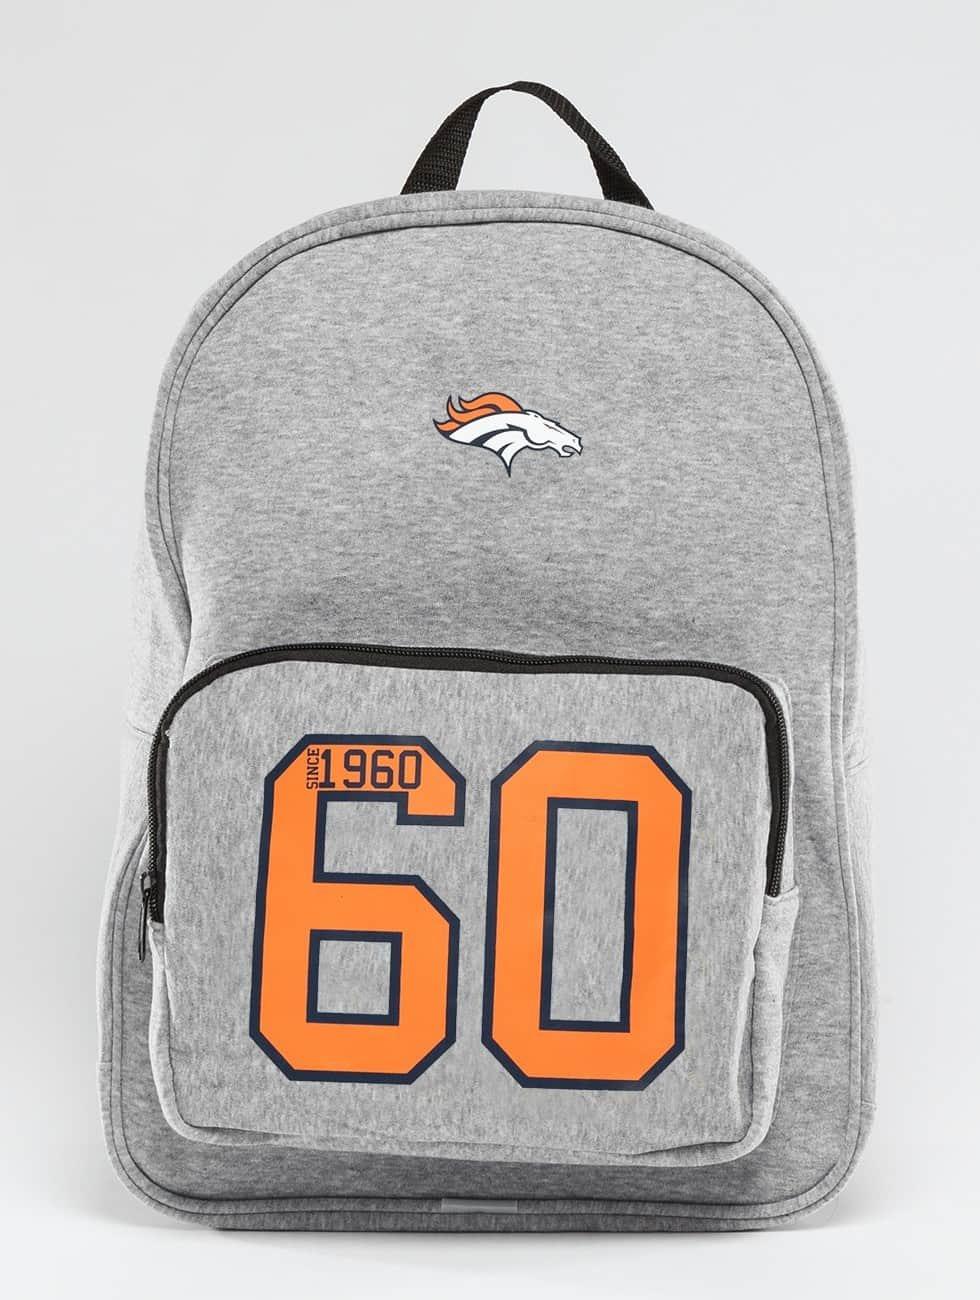 Forever Collectibles Plecaki NFL Denver Broncos szary